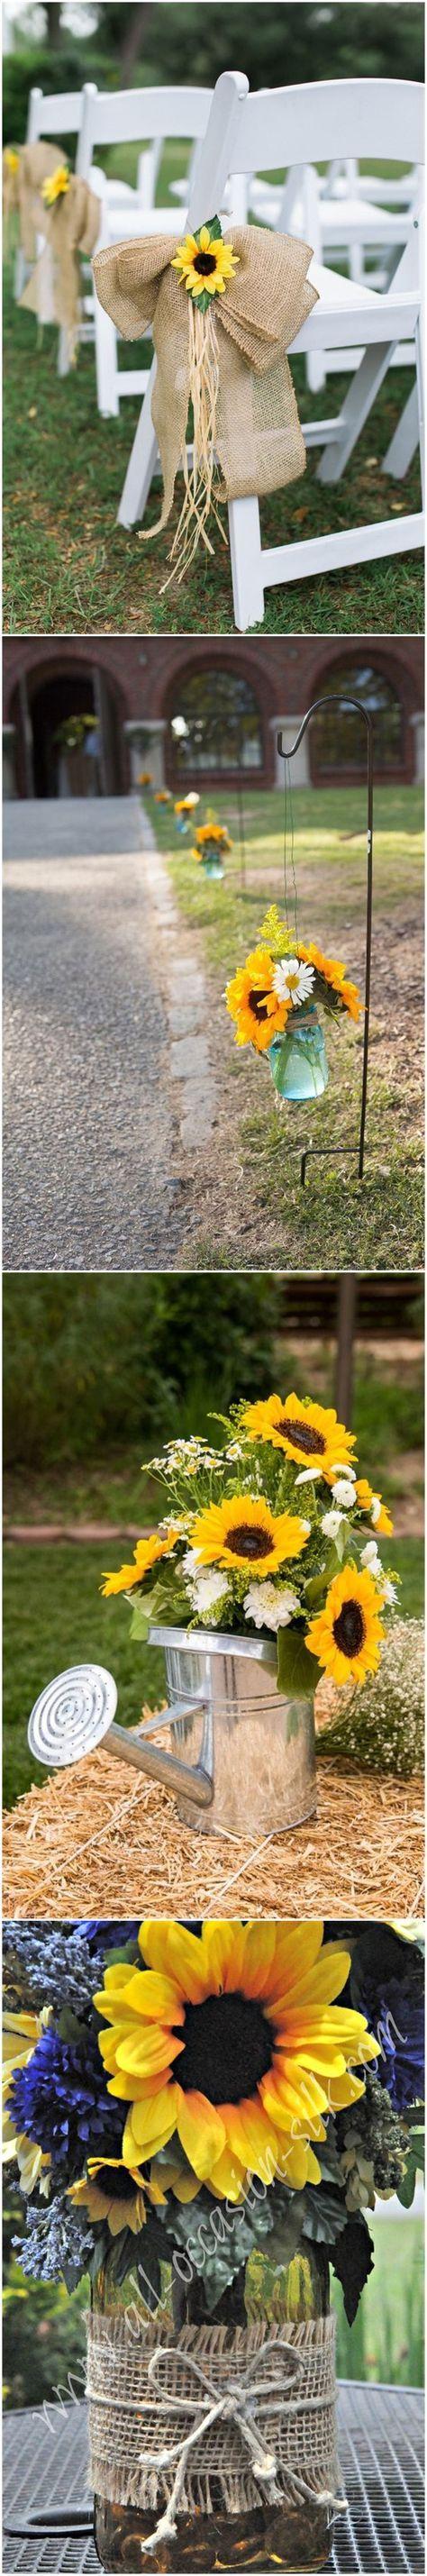 23 Bright Sunflower Wedding Decoration Ideas For Your Rustic Wedding Sunflower wedding